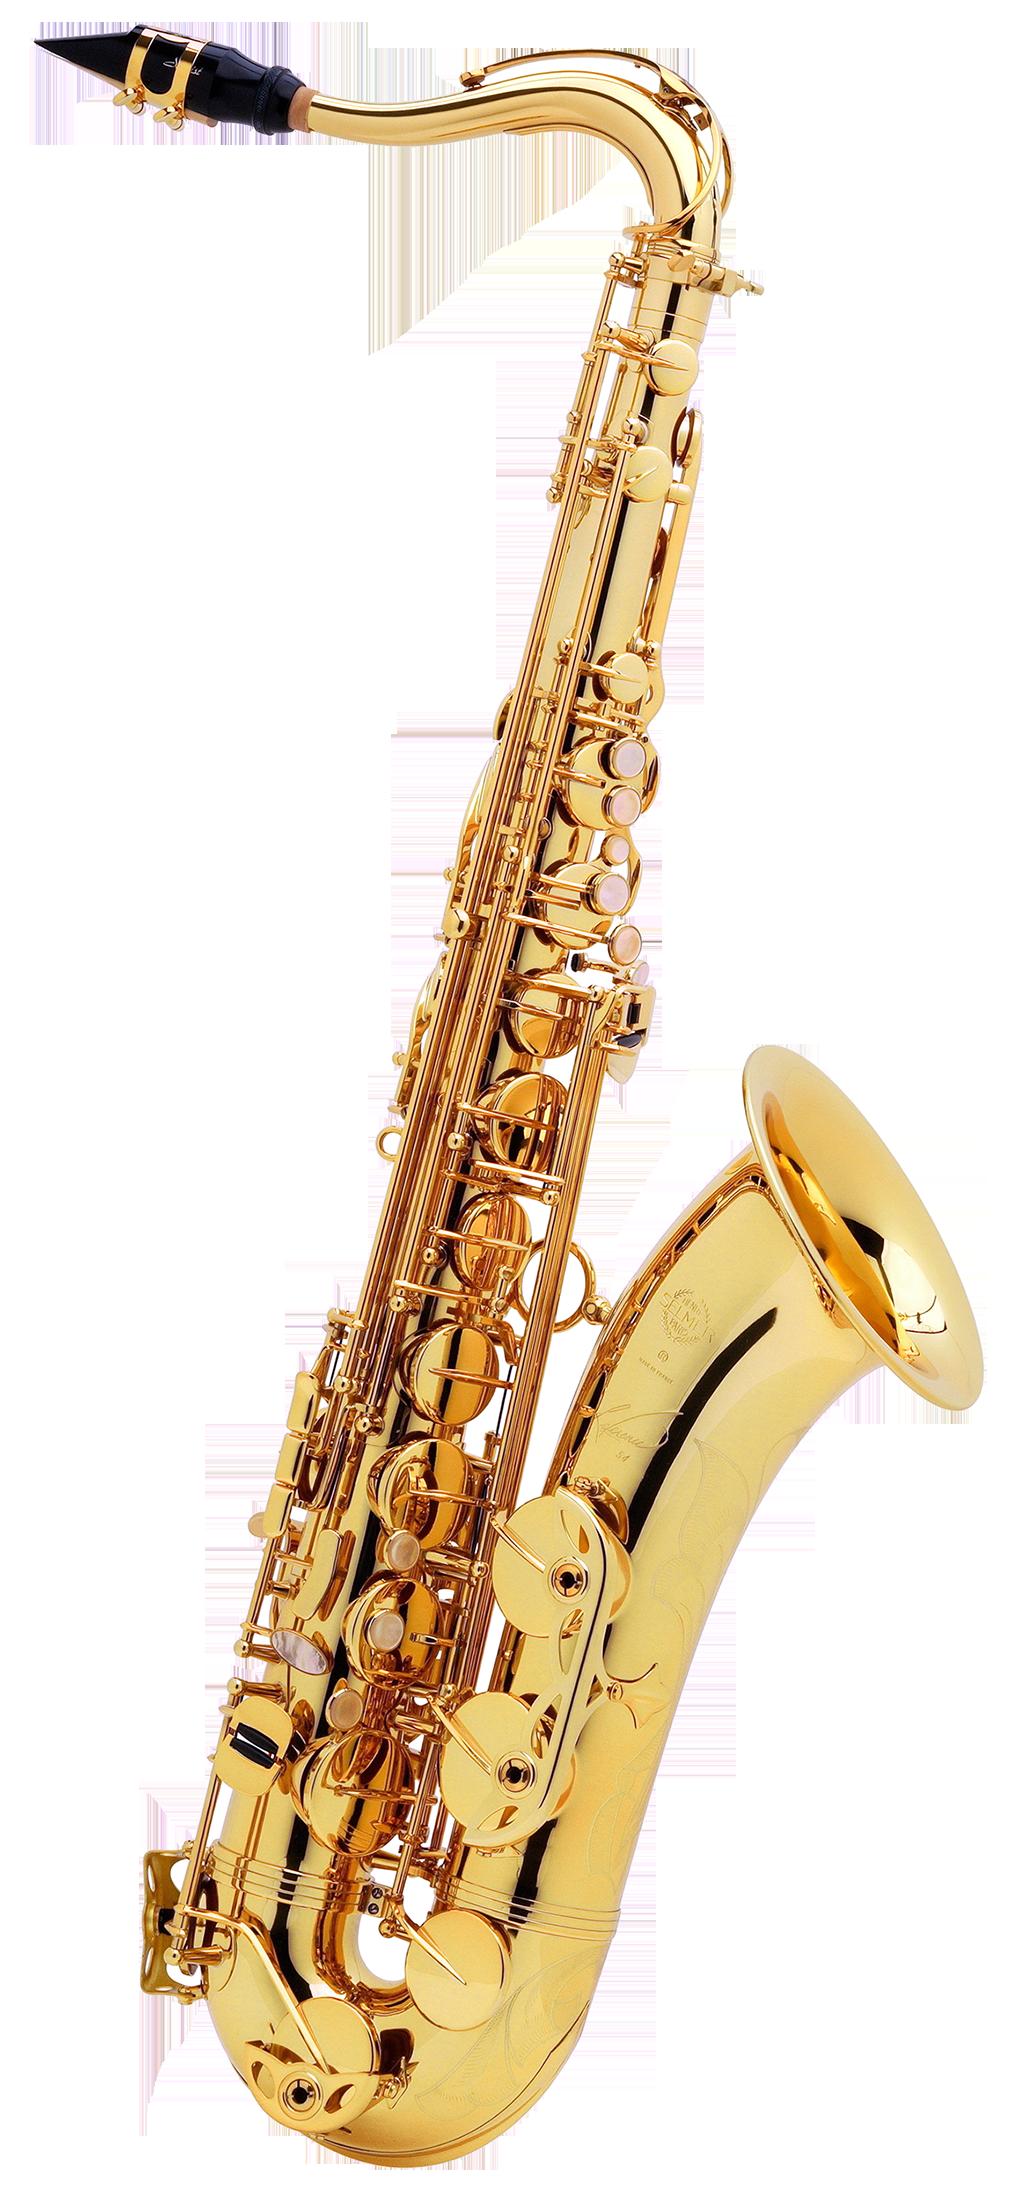 Selmer REFERENCE 54 GG - Tenor saxofon